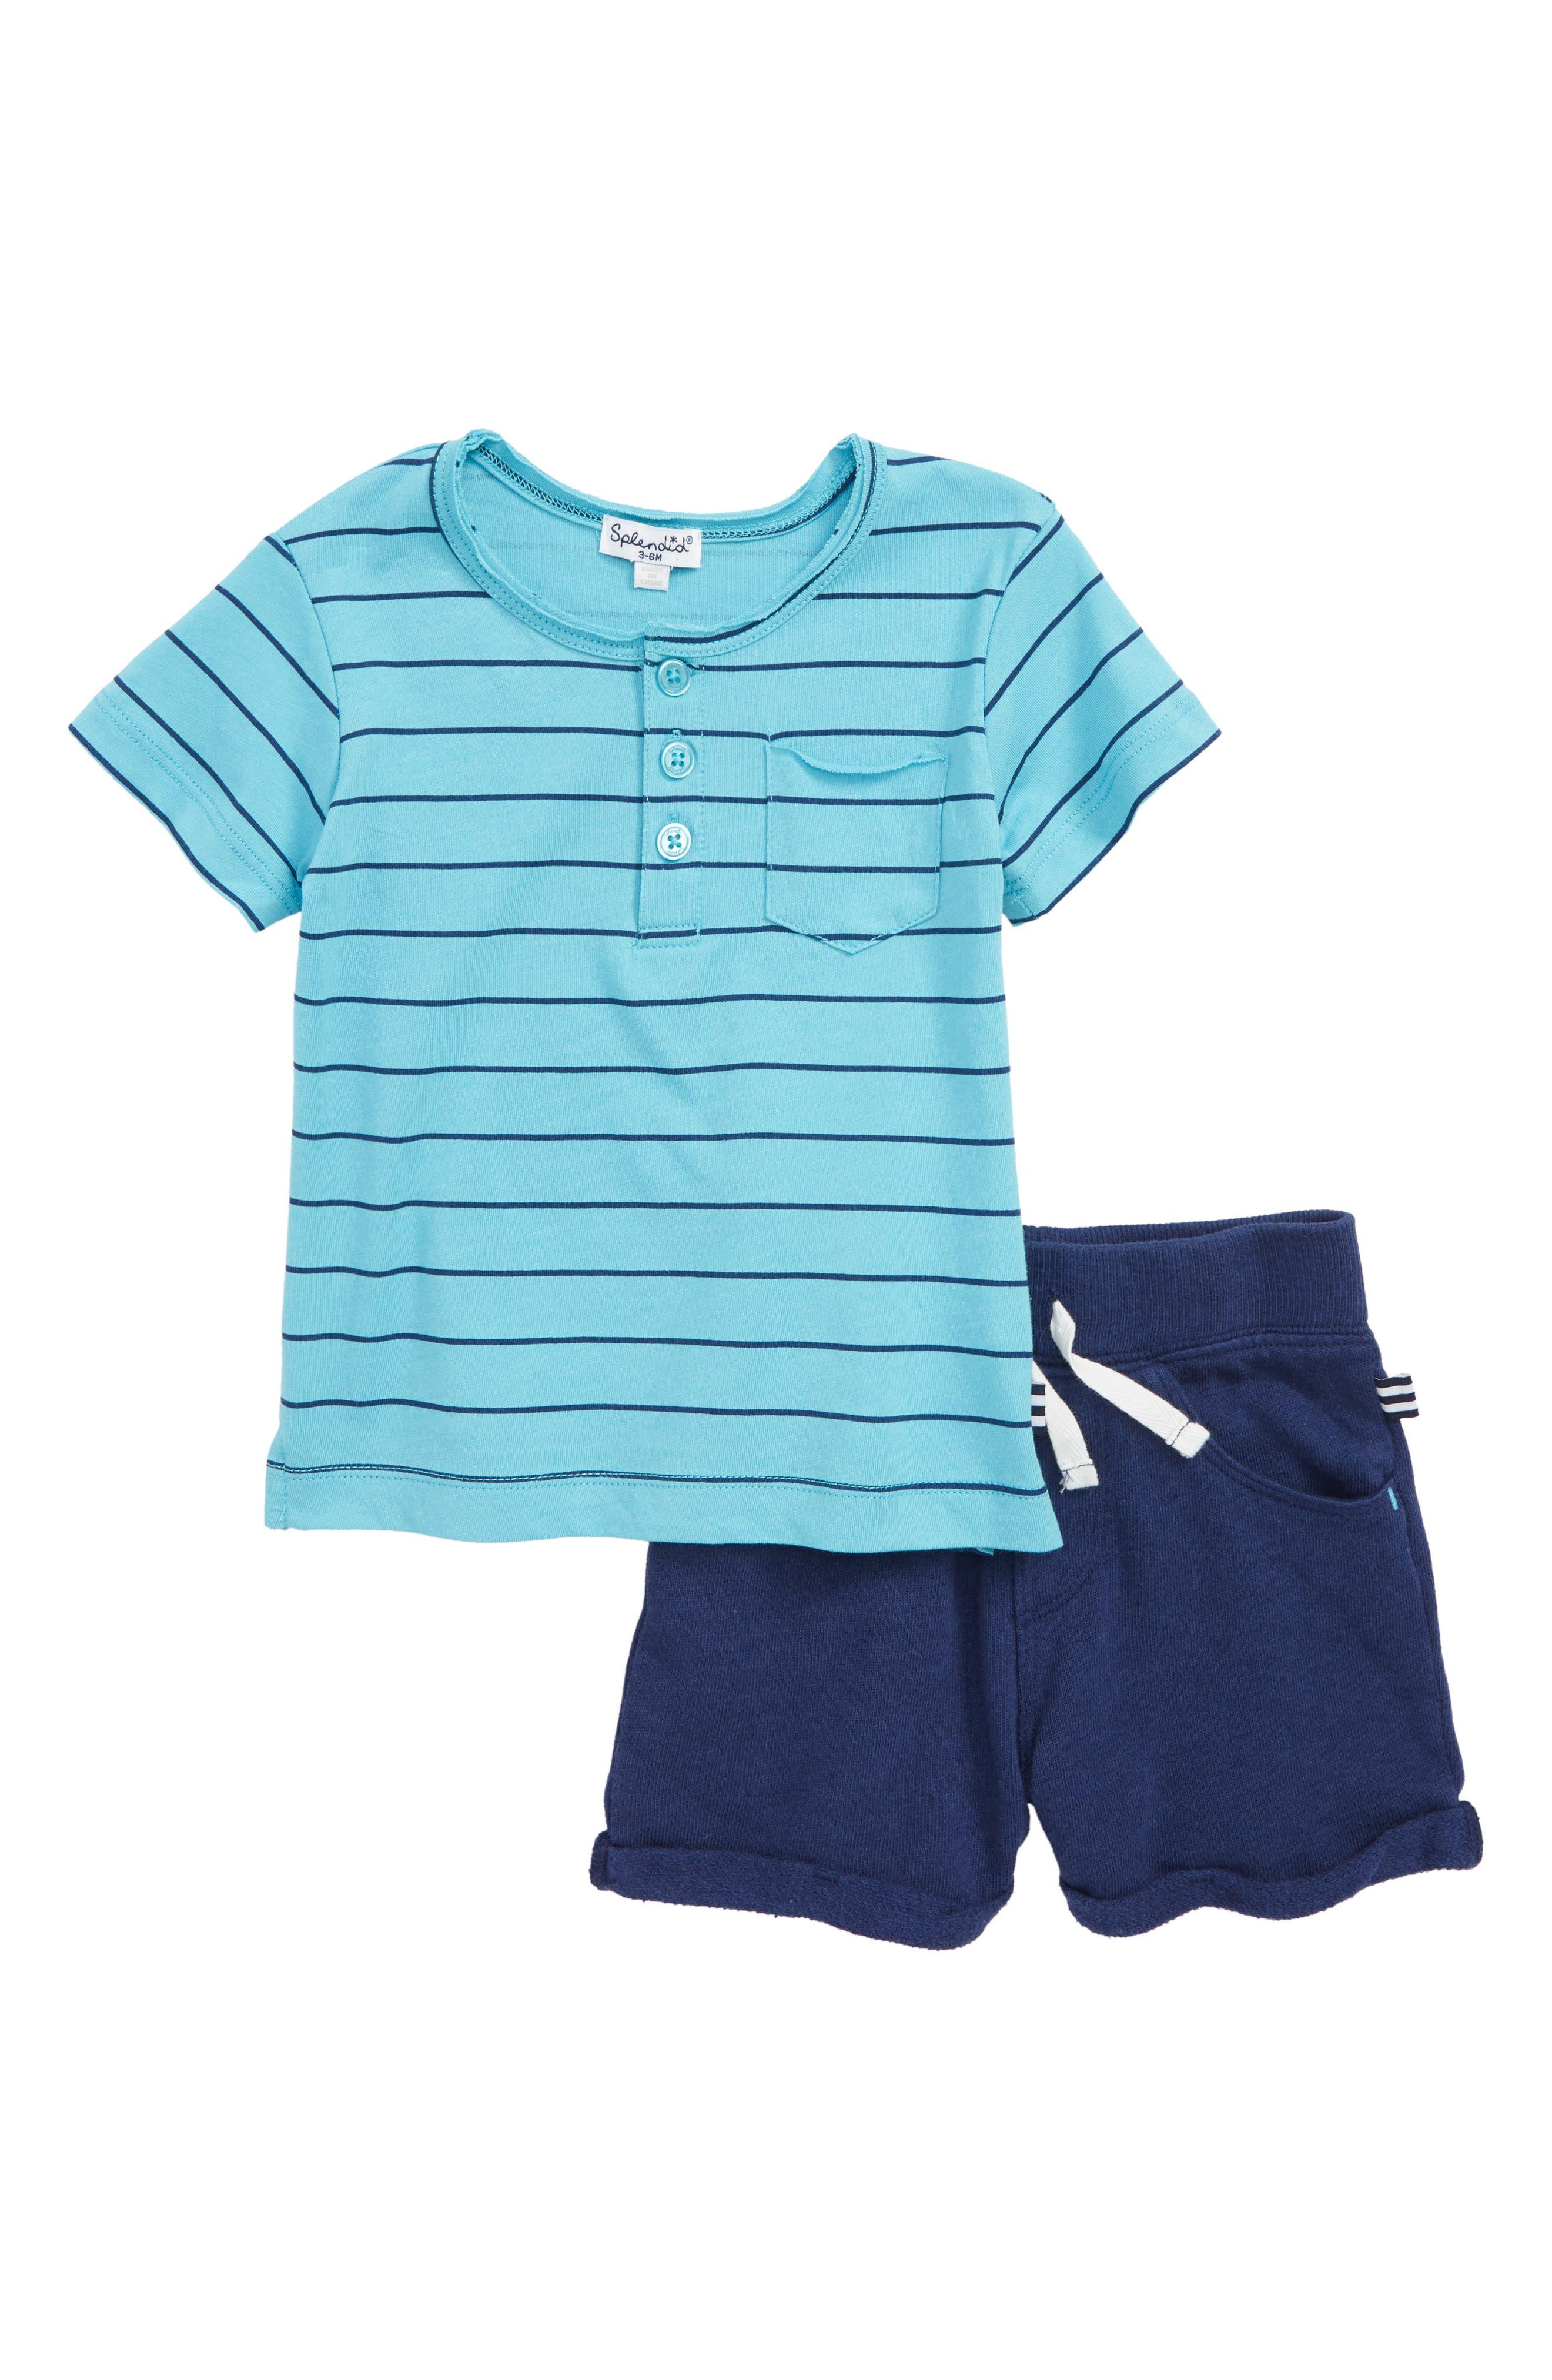 Henley T-Shirt & Shorts Set,                         Main,                         color, 400